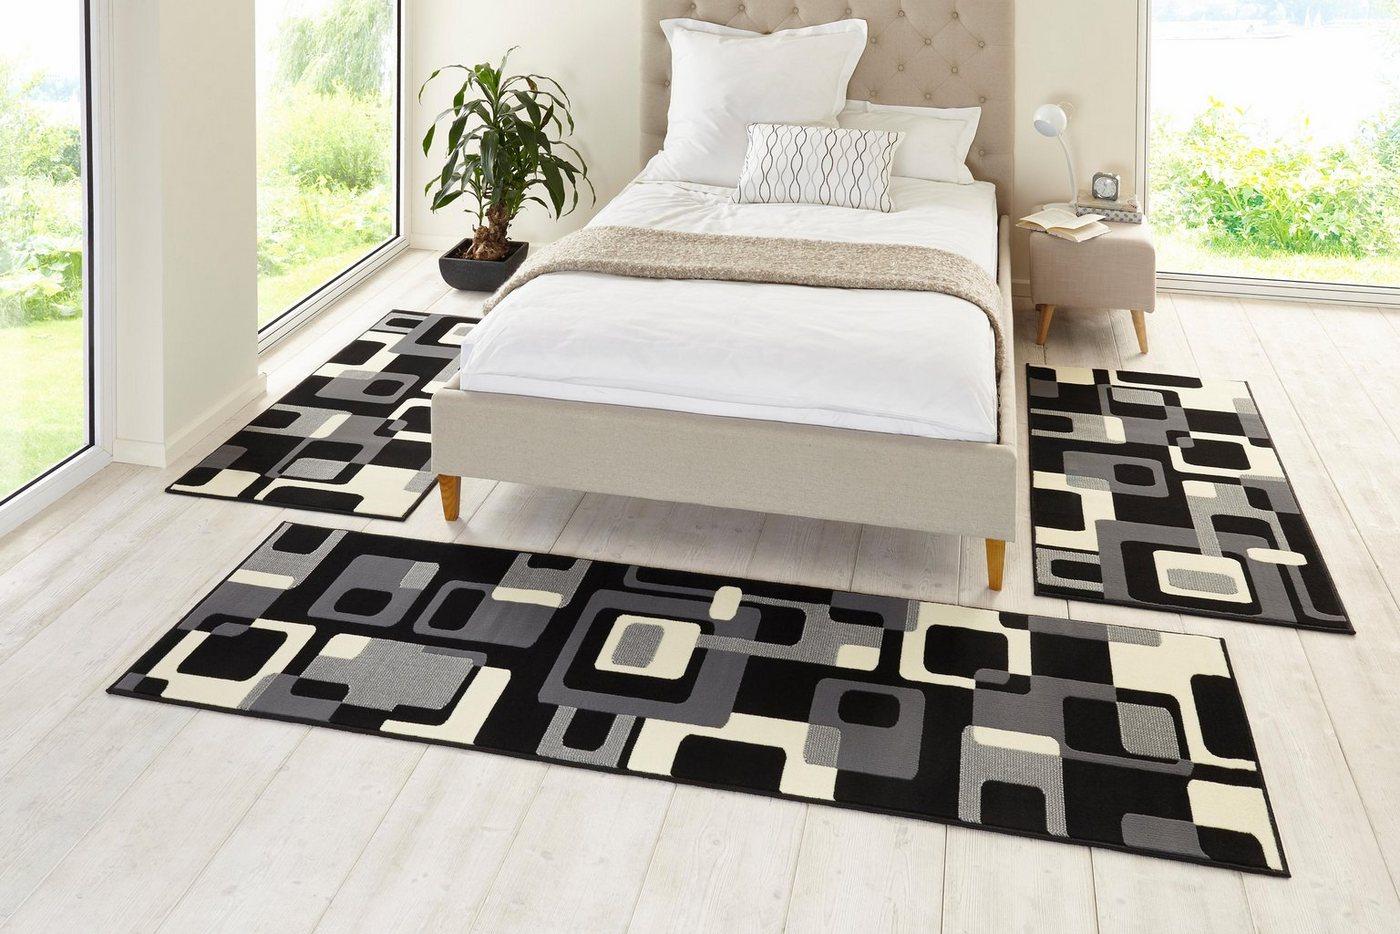 Slaapkamerset 3-dlg., HANSE HOME, Tiznit, retro-design, abstract, geweven